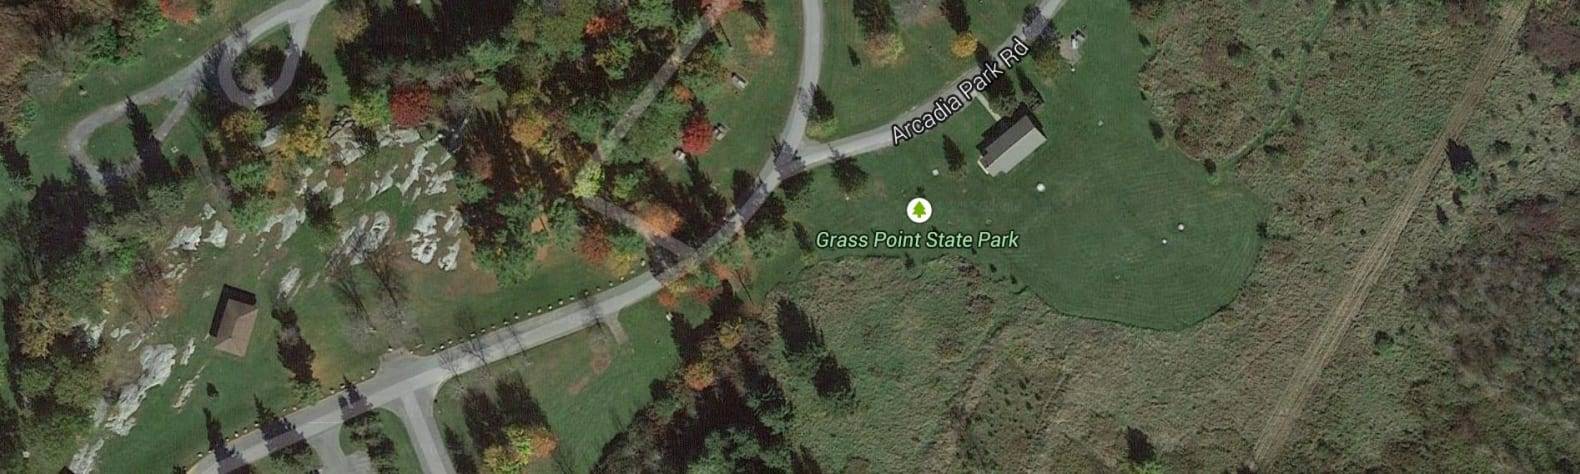 Grass Point State Park